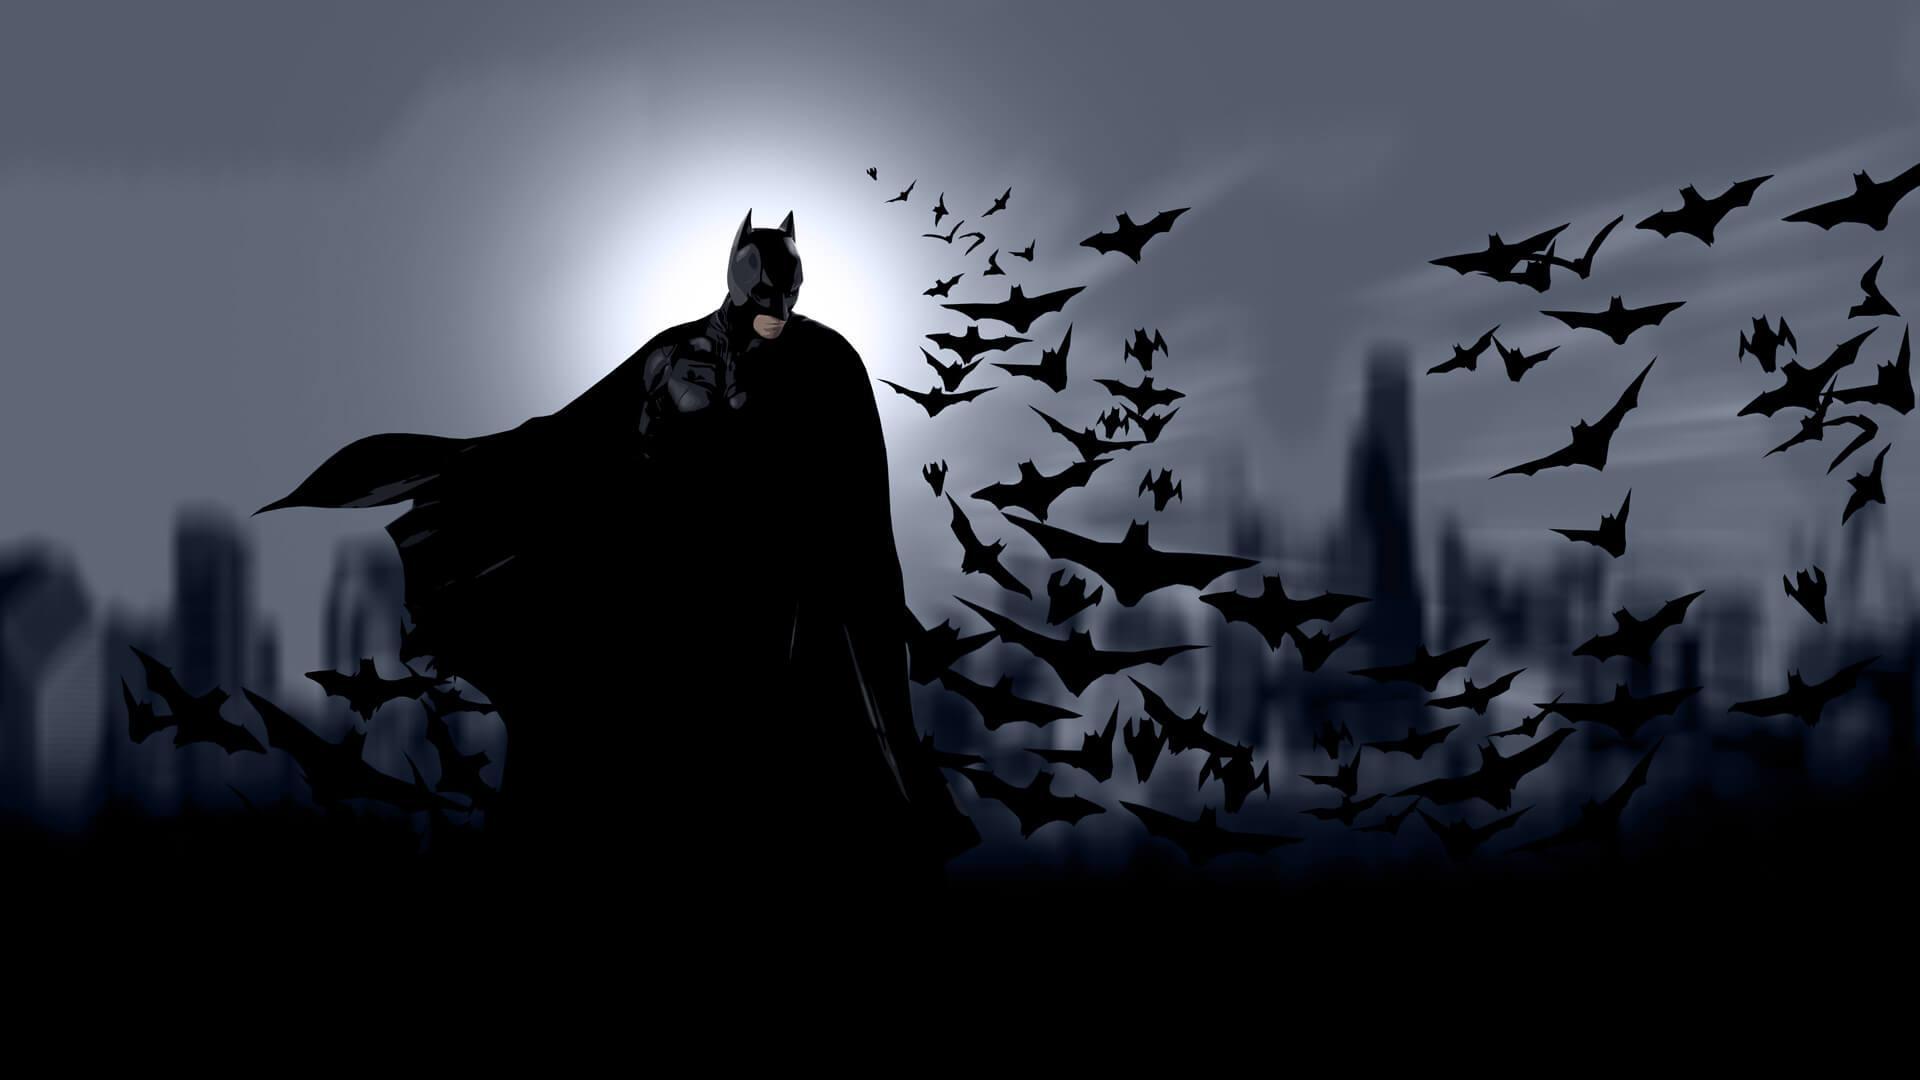 4K Ultra HD Batcave Wallpapers - Top Free 4K Ultra HD ...